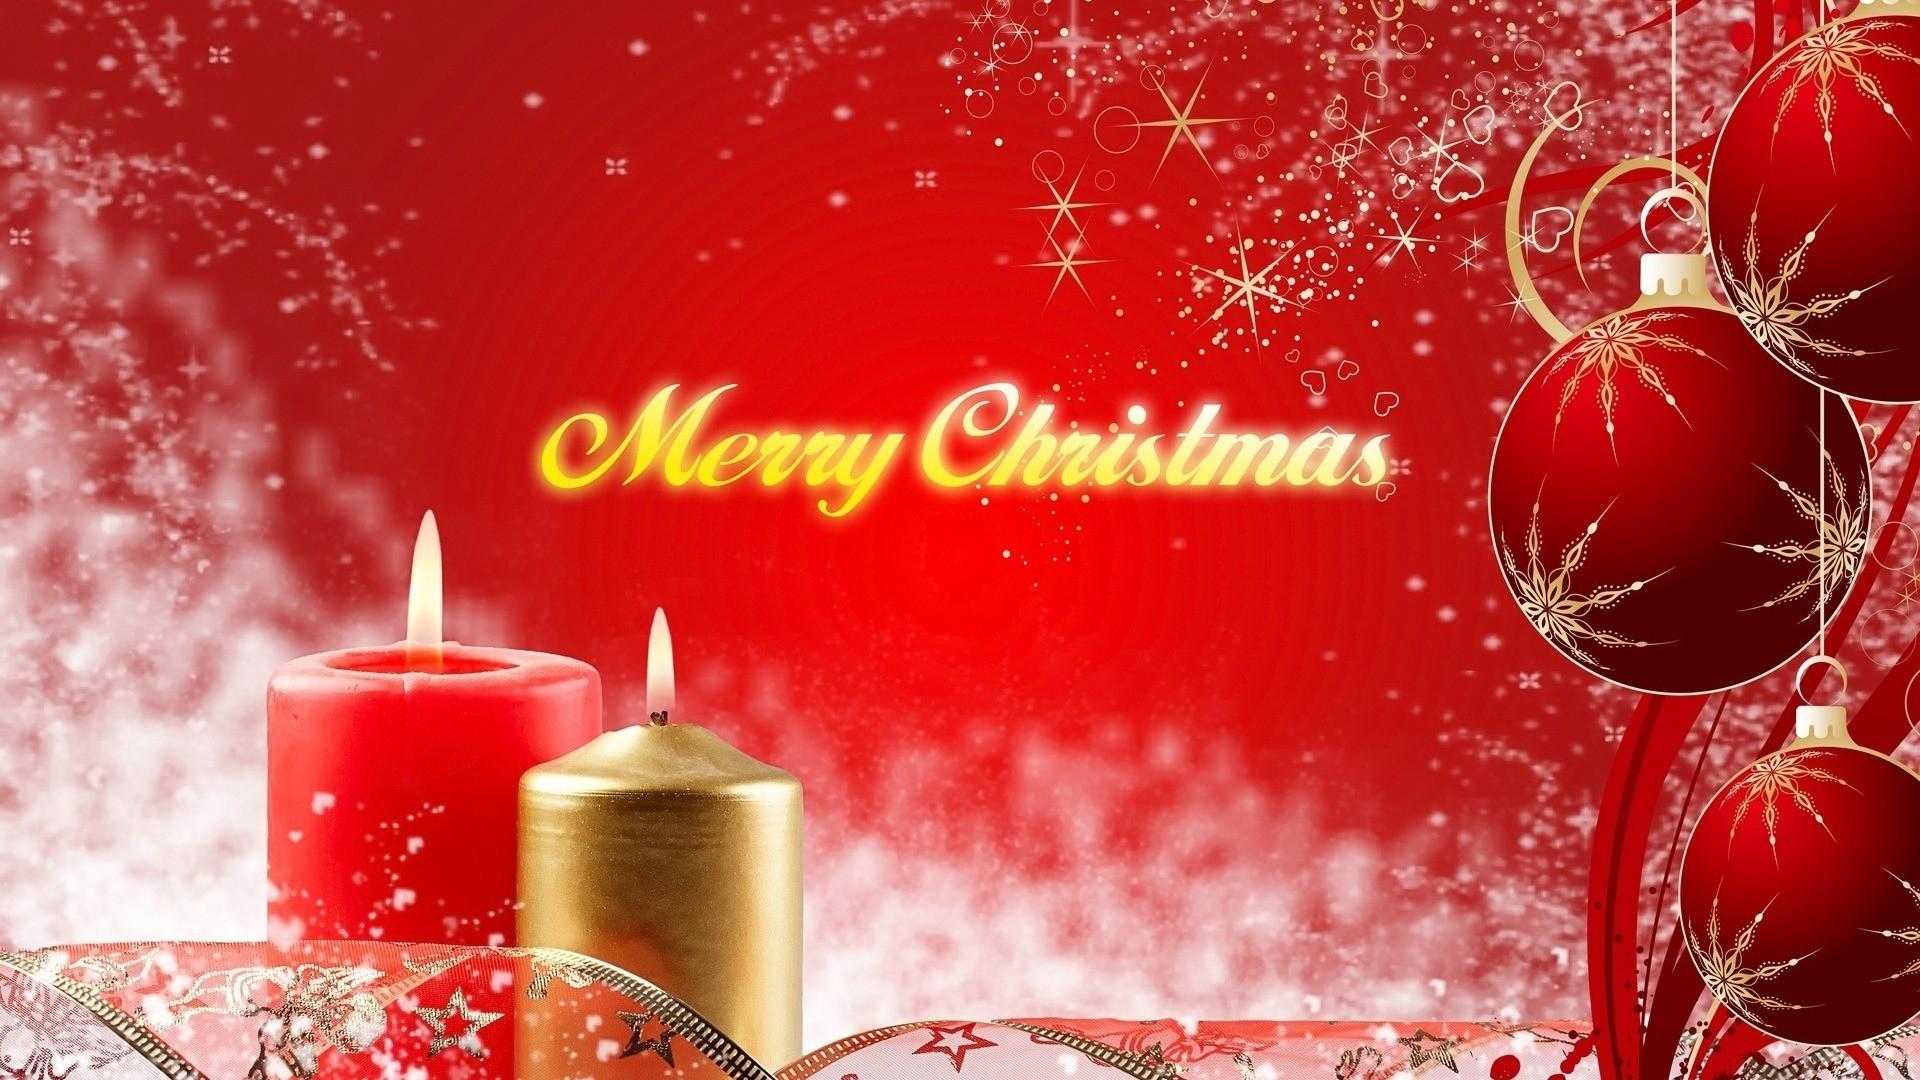 merry christmas red balls candles cute hd wallpaper